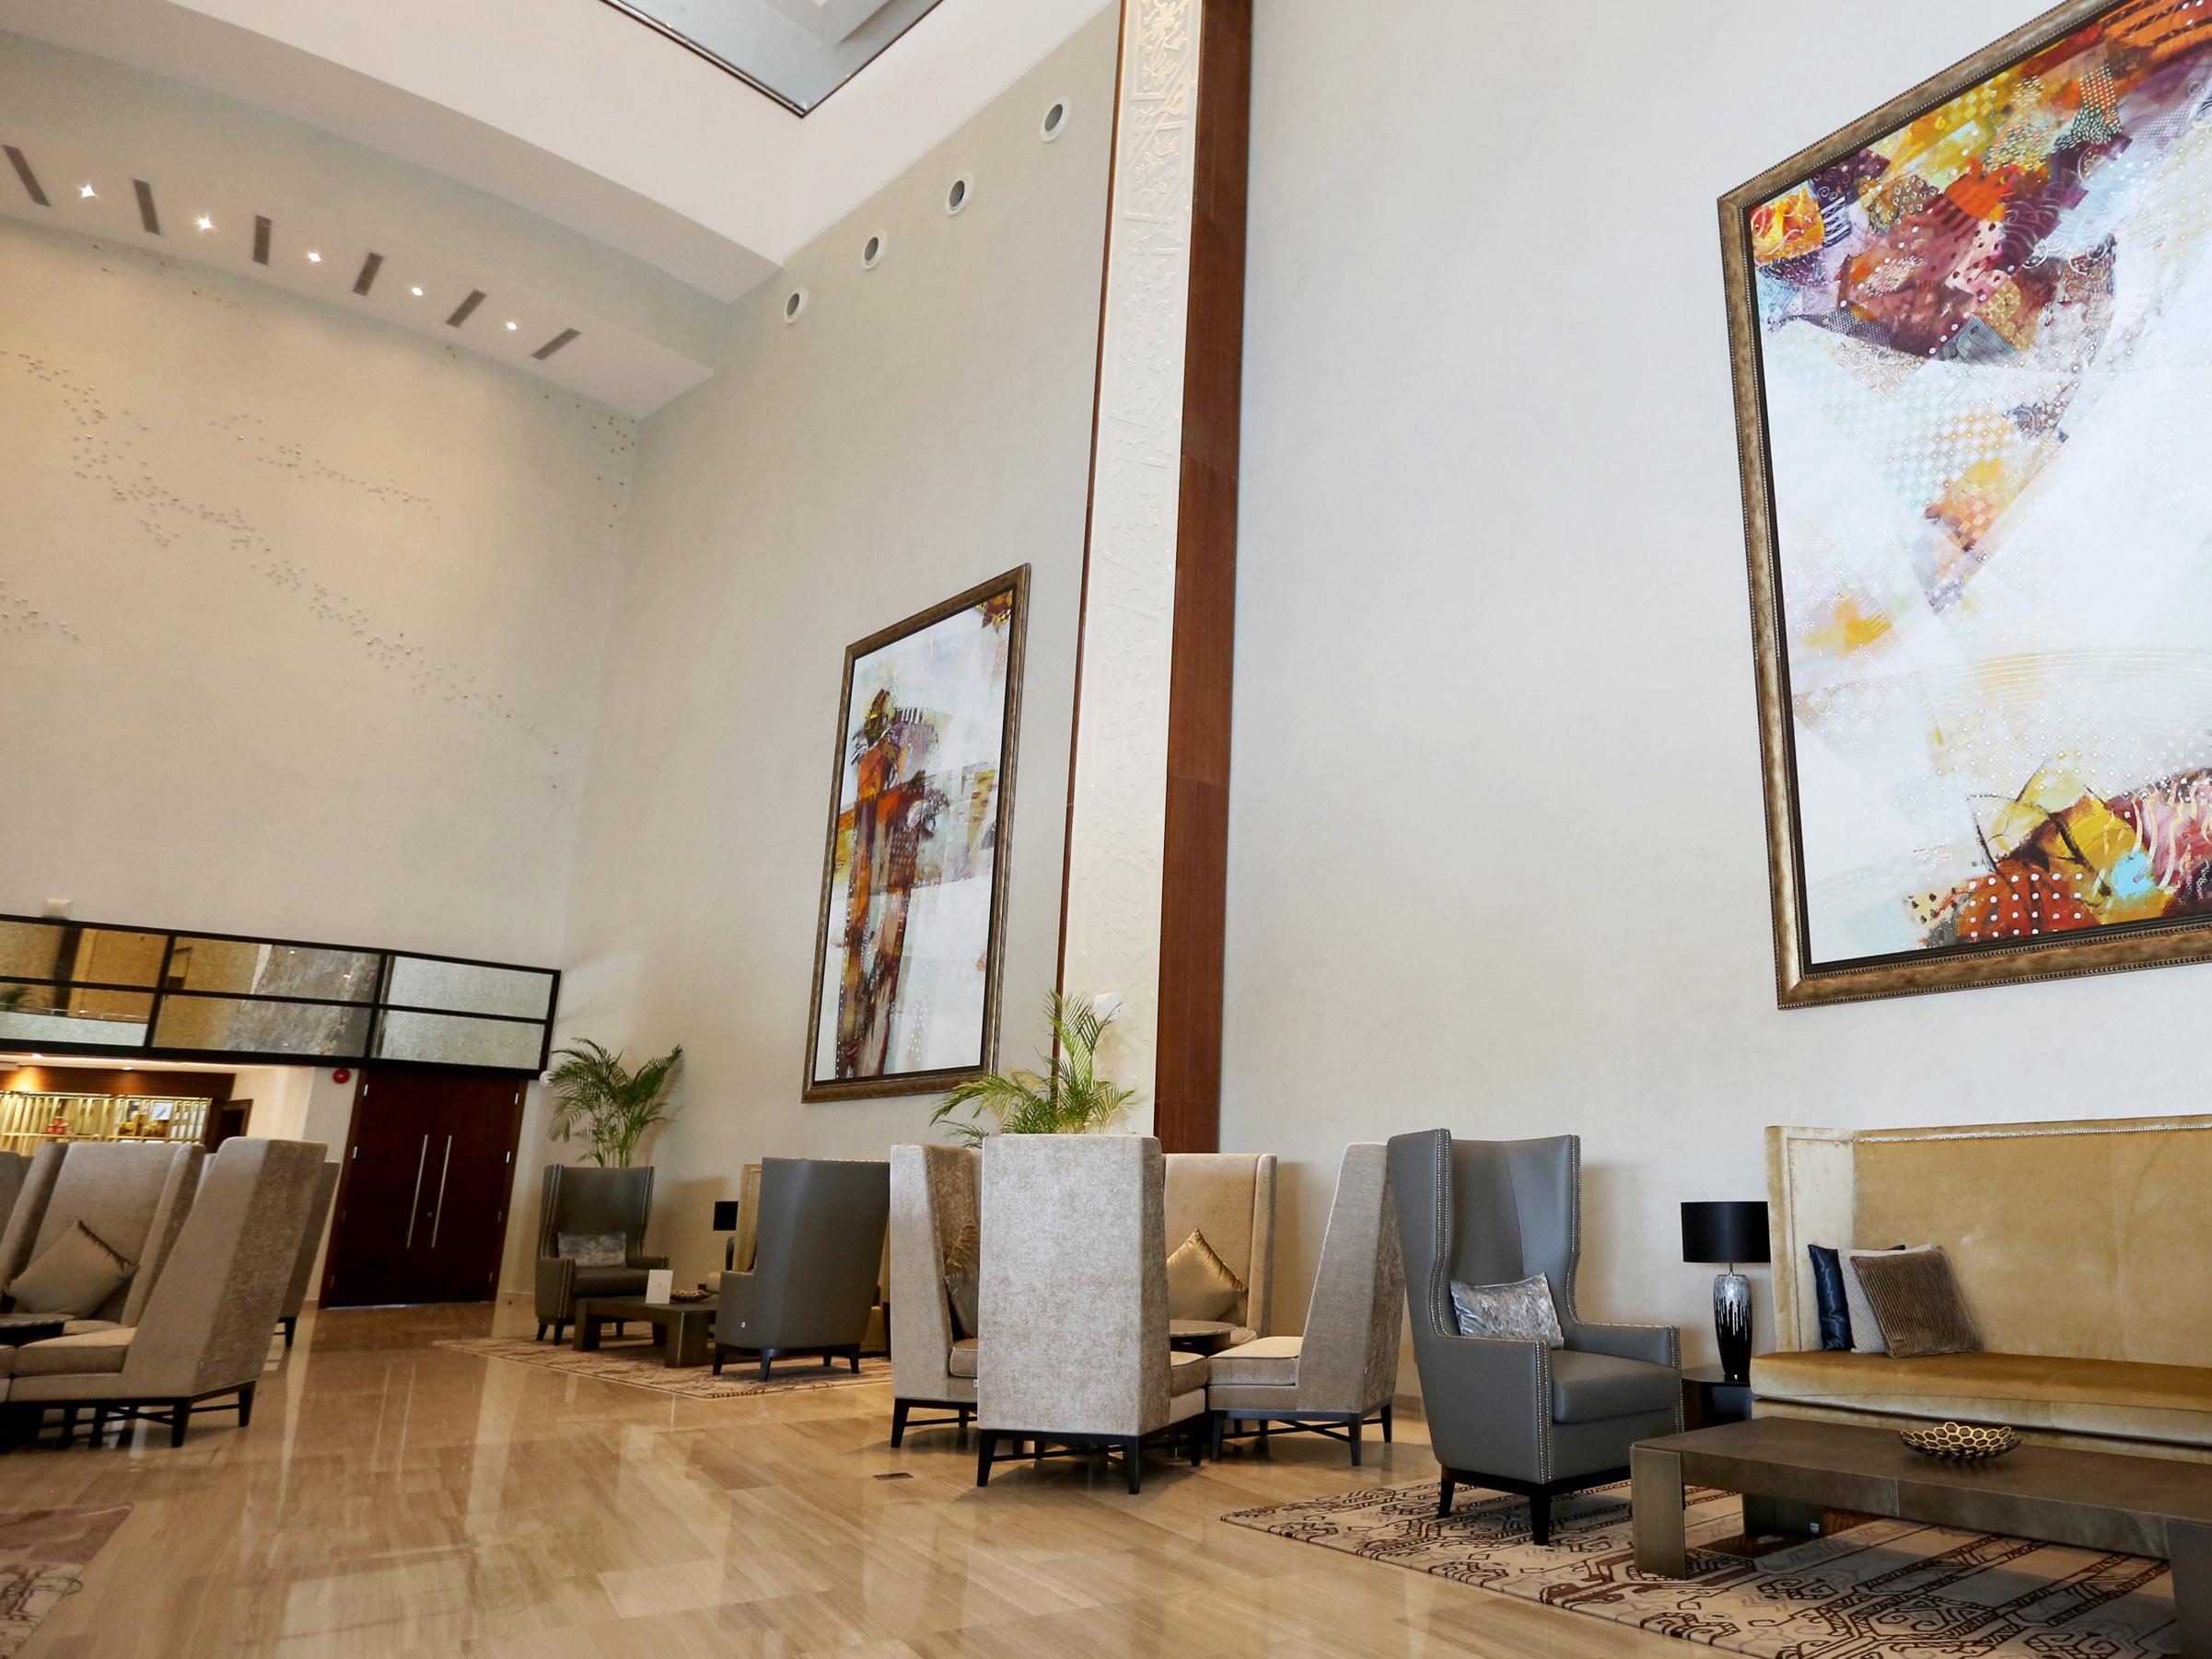 BAY LA SUN HOTEL